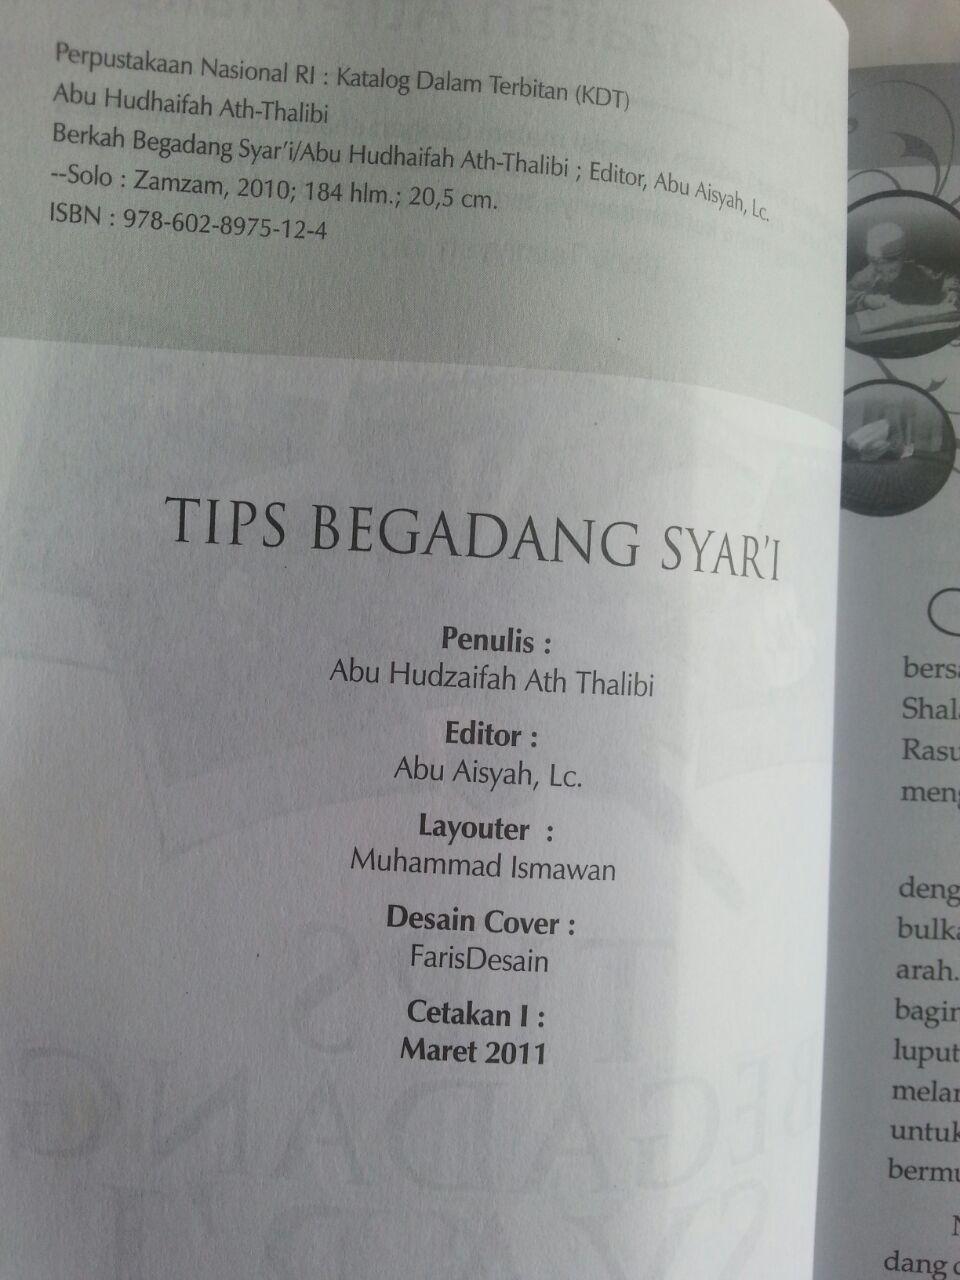 Buku Tips Begadang Syar'I Mendulang Berkah Malam isi